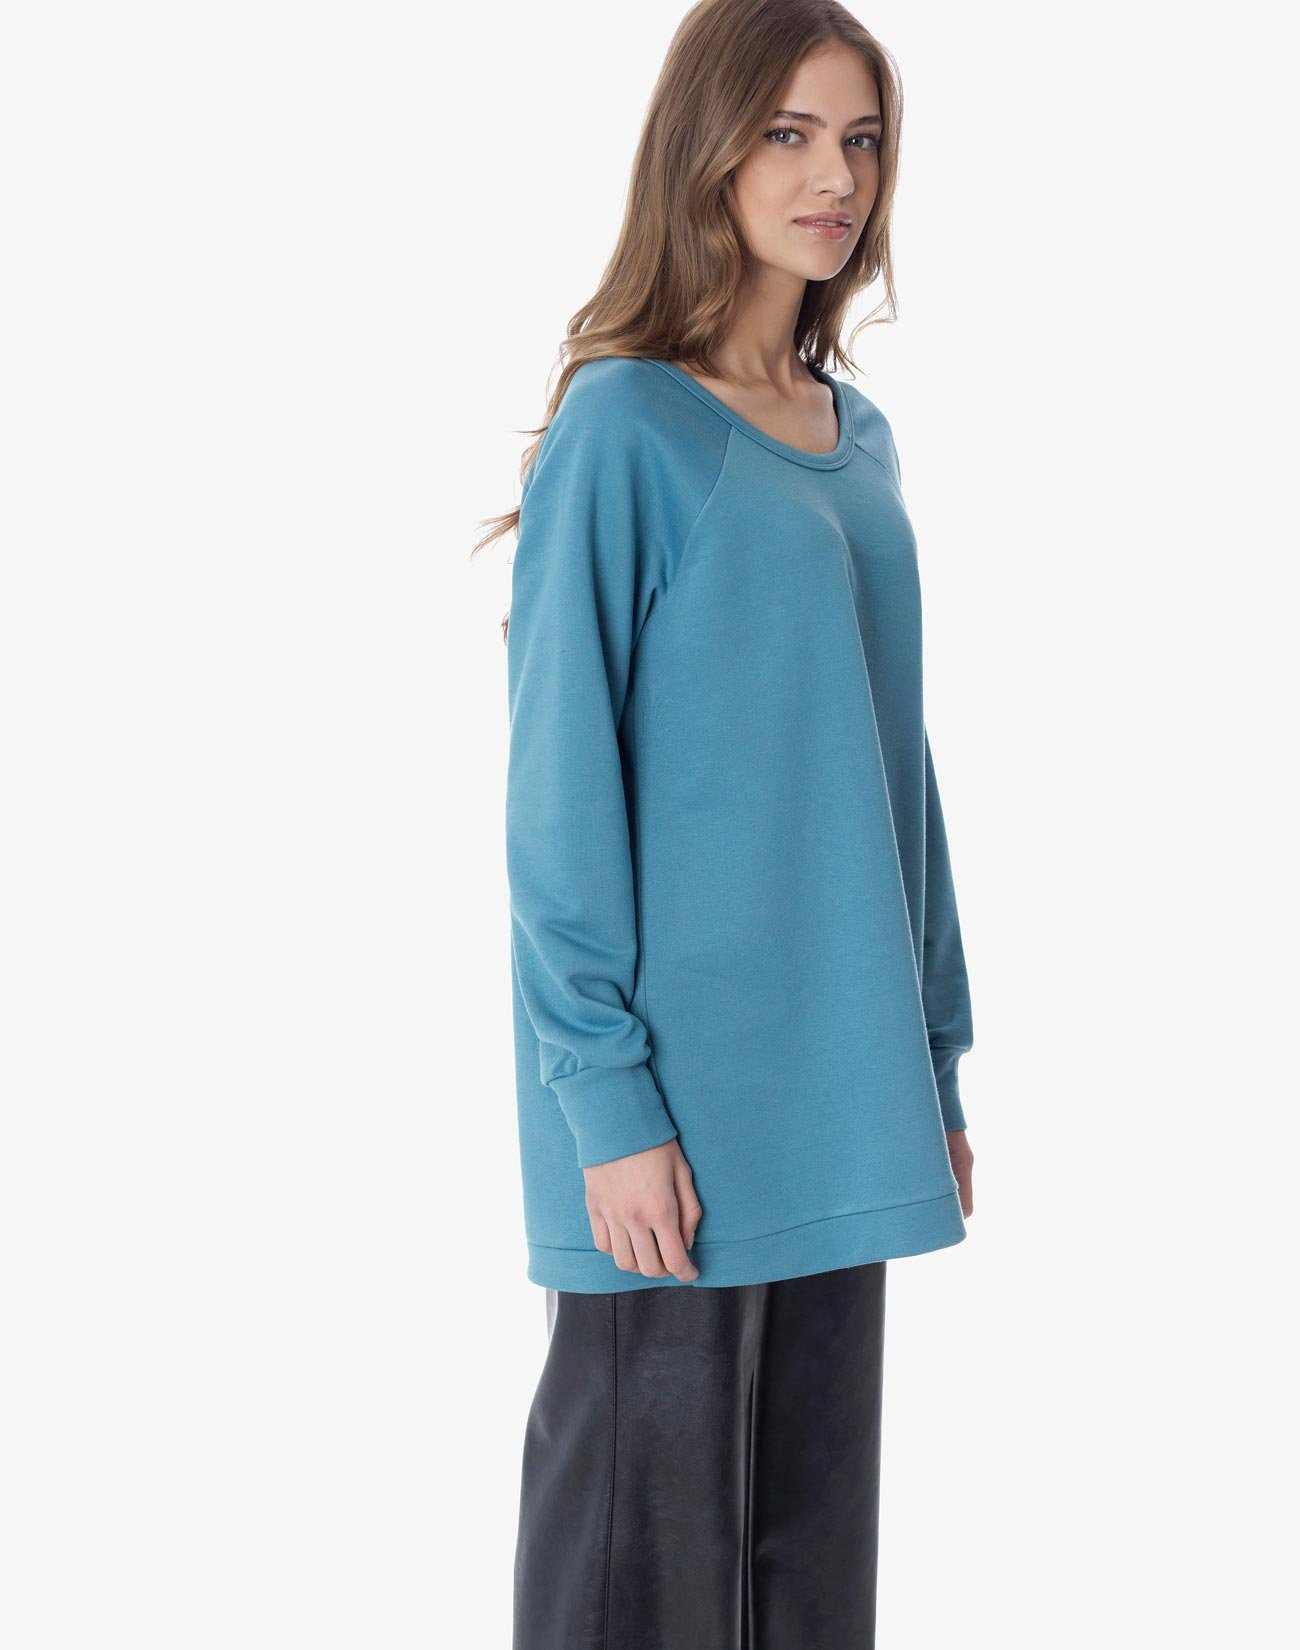 Oversized φούτερ με φιόγκο